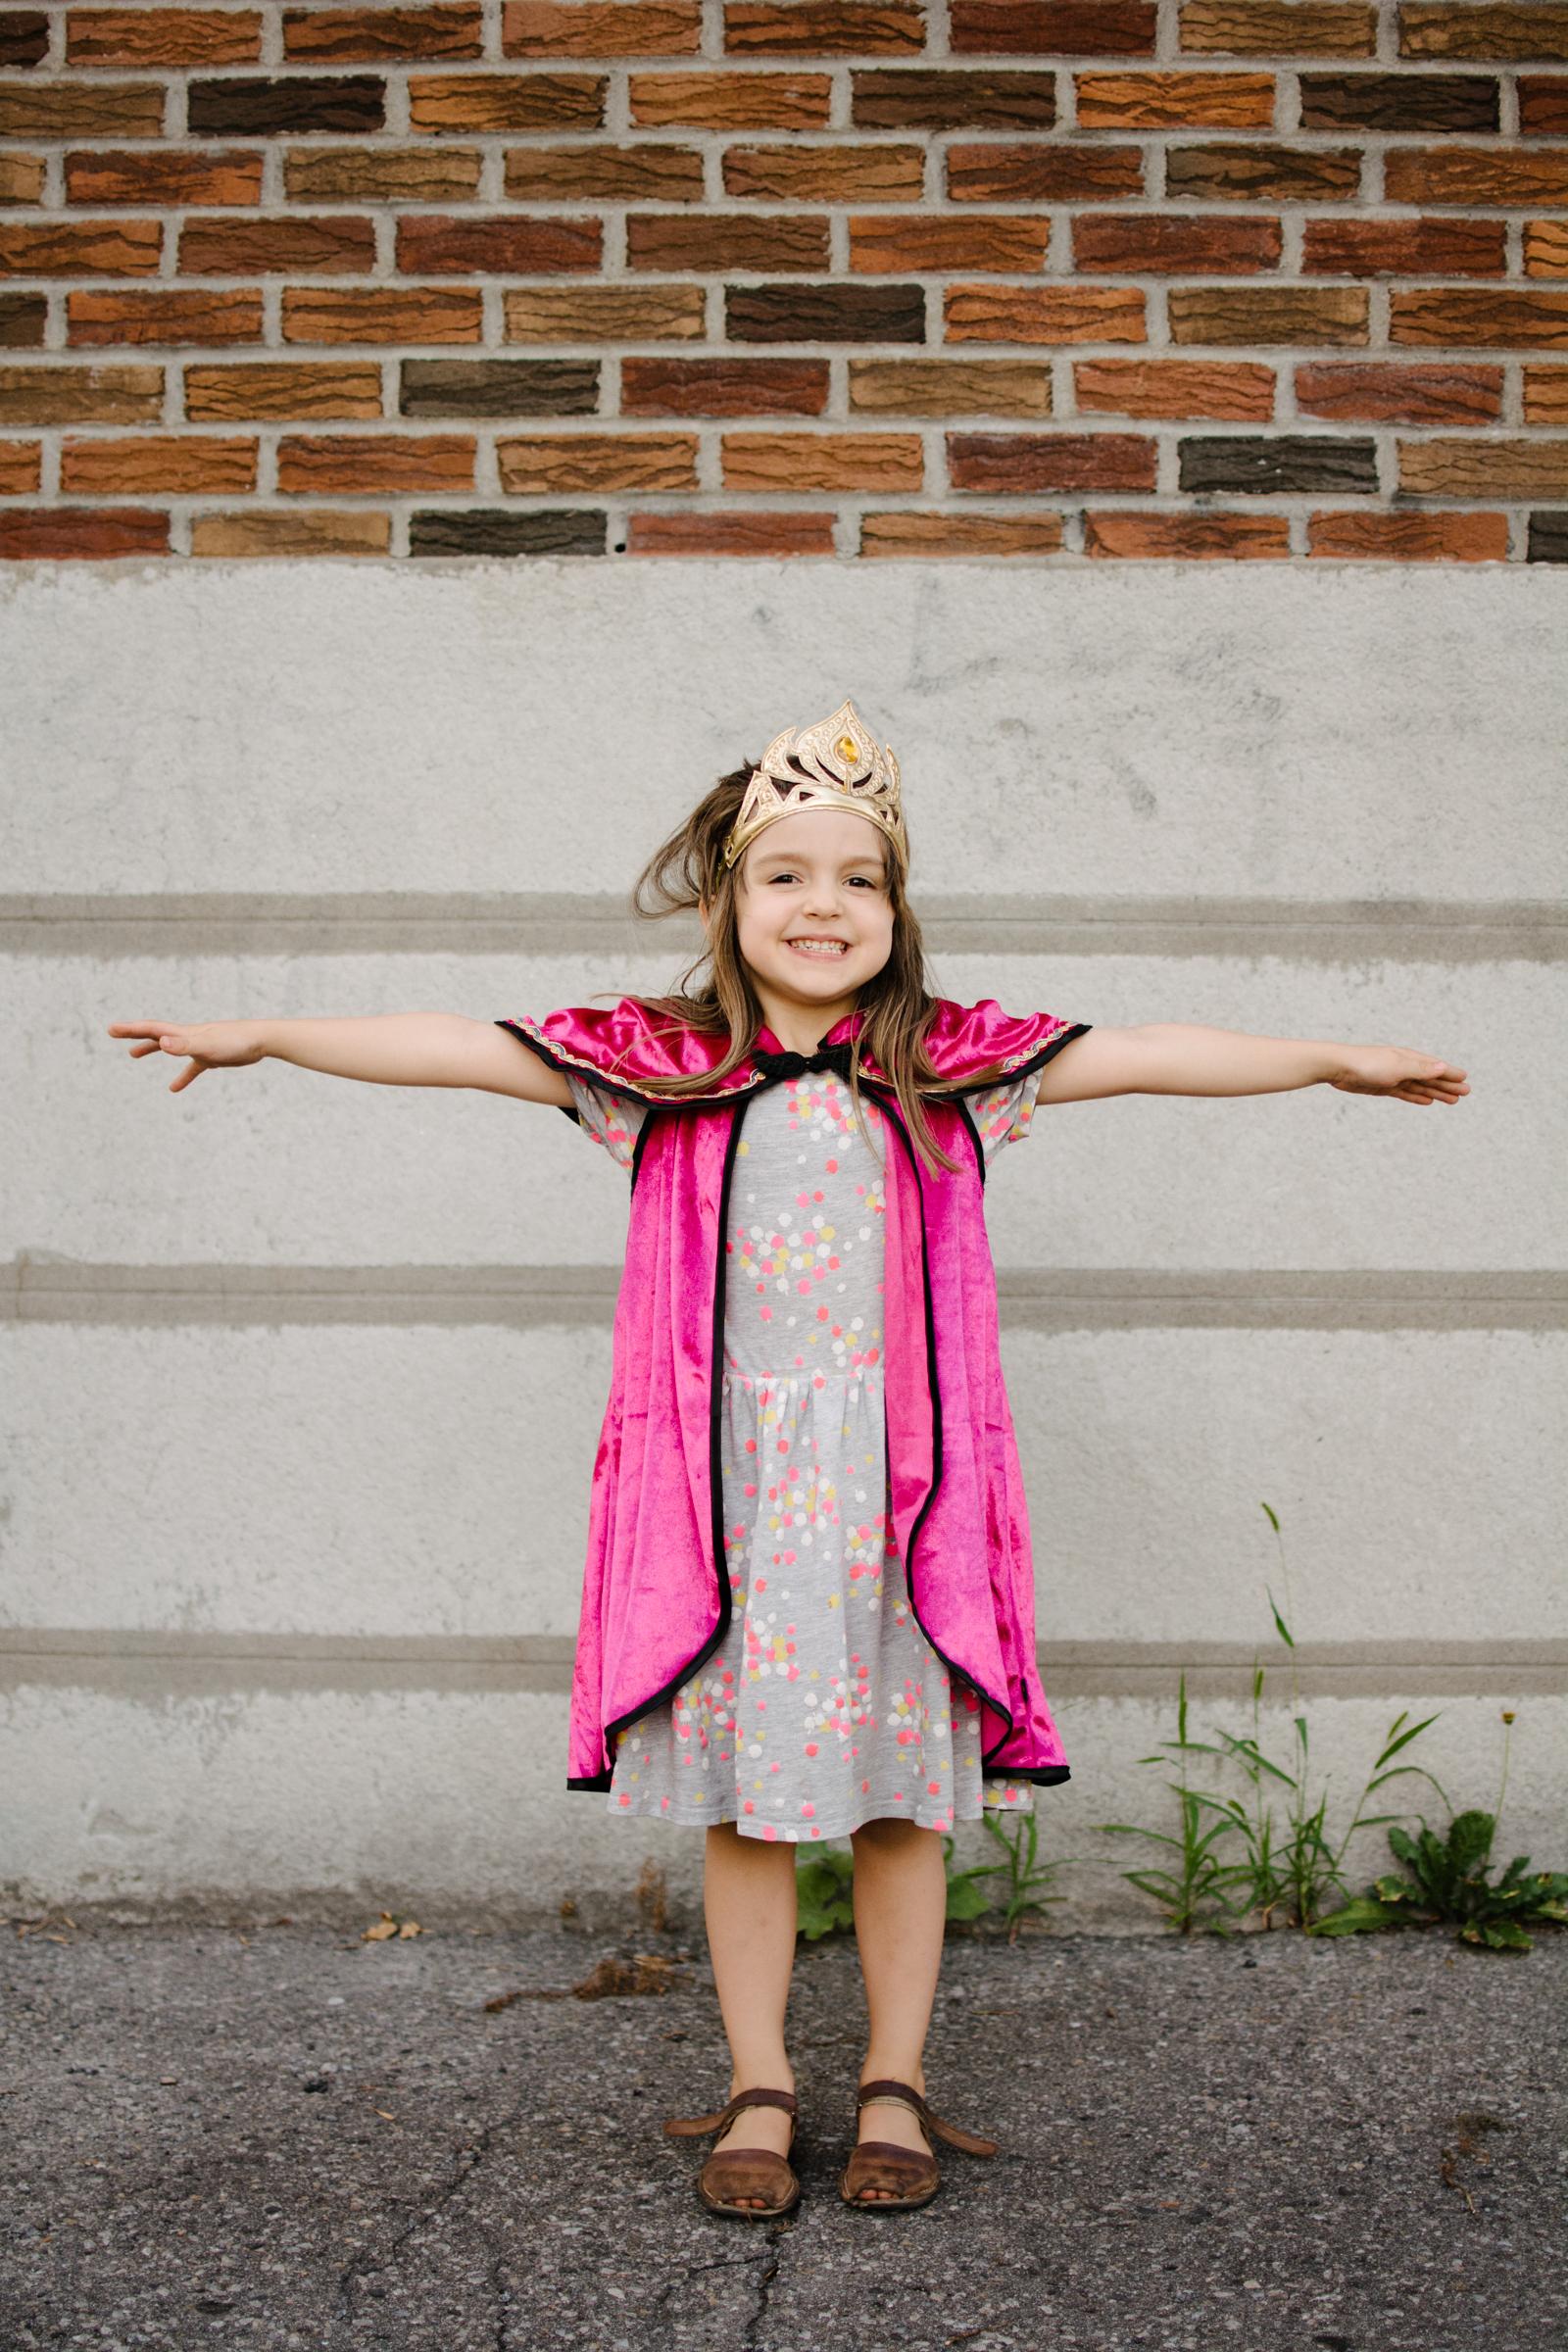 photo-d-une-fillette-deguisee-en-princesse-superhero-photographe-lifestyle-de-famille--a-montreal-marianne-charland-017.jpg